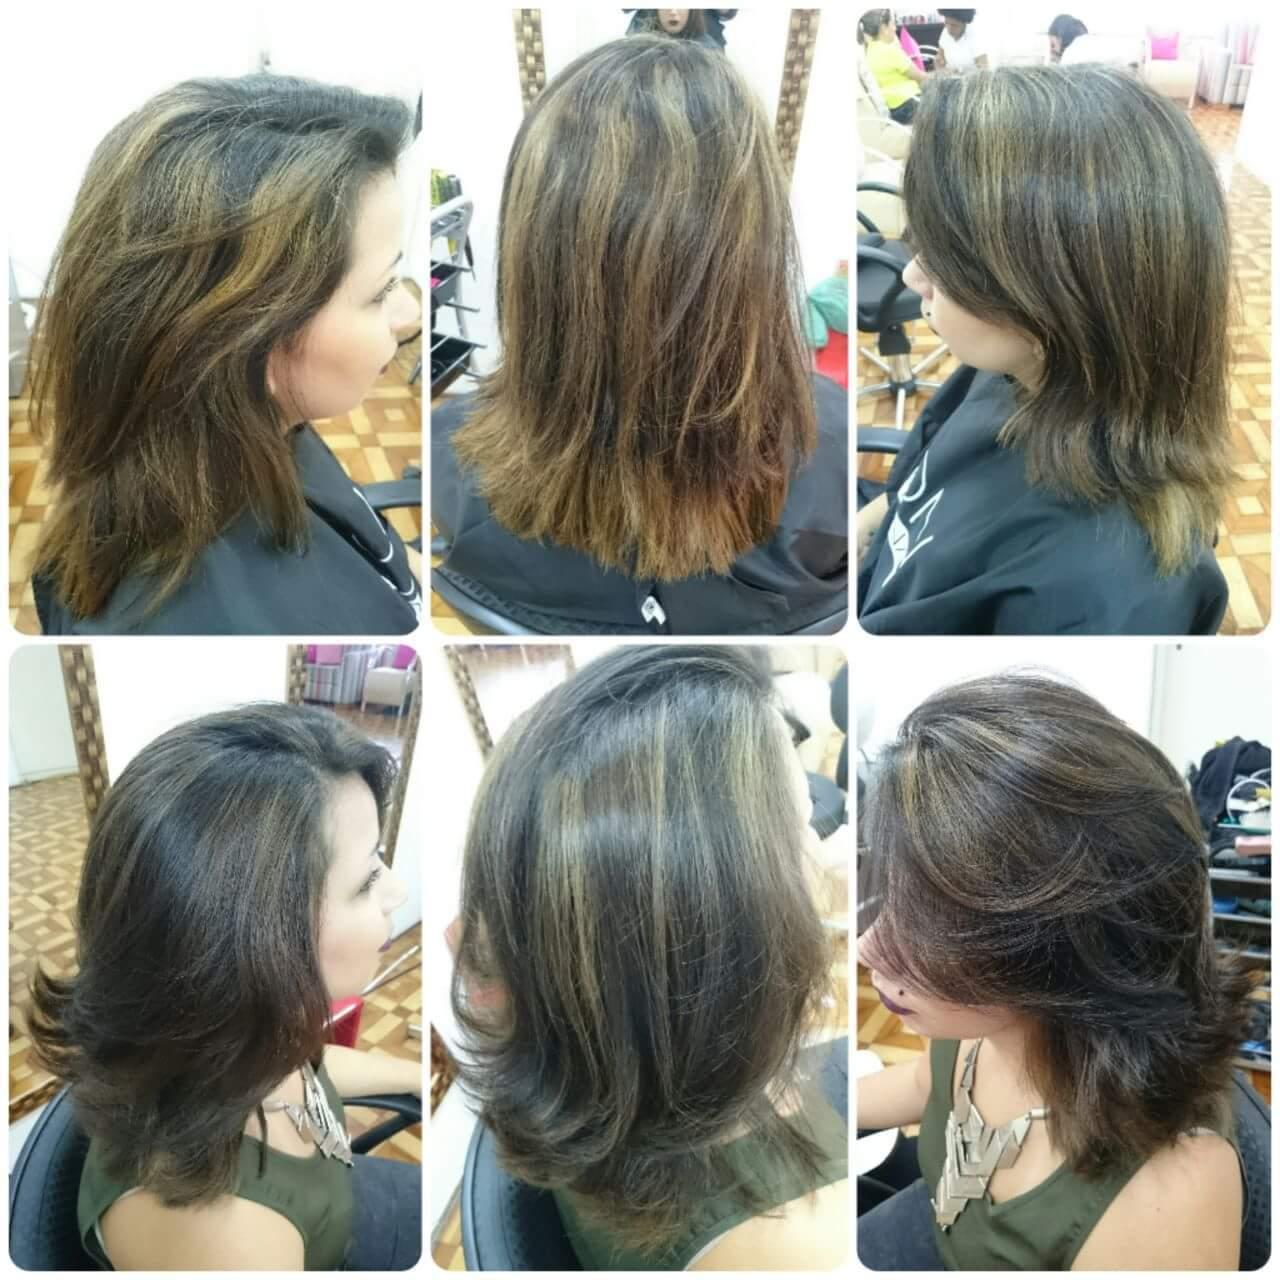 #tranformation #transformacao #correcaodecor #antesedepois #babylights  cabelo cabeleireiro(a) maquiador(a) designer de sobrancelhas